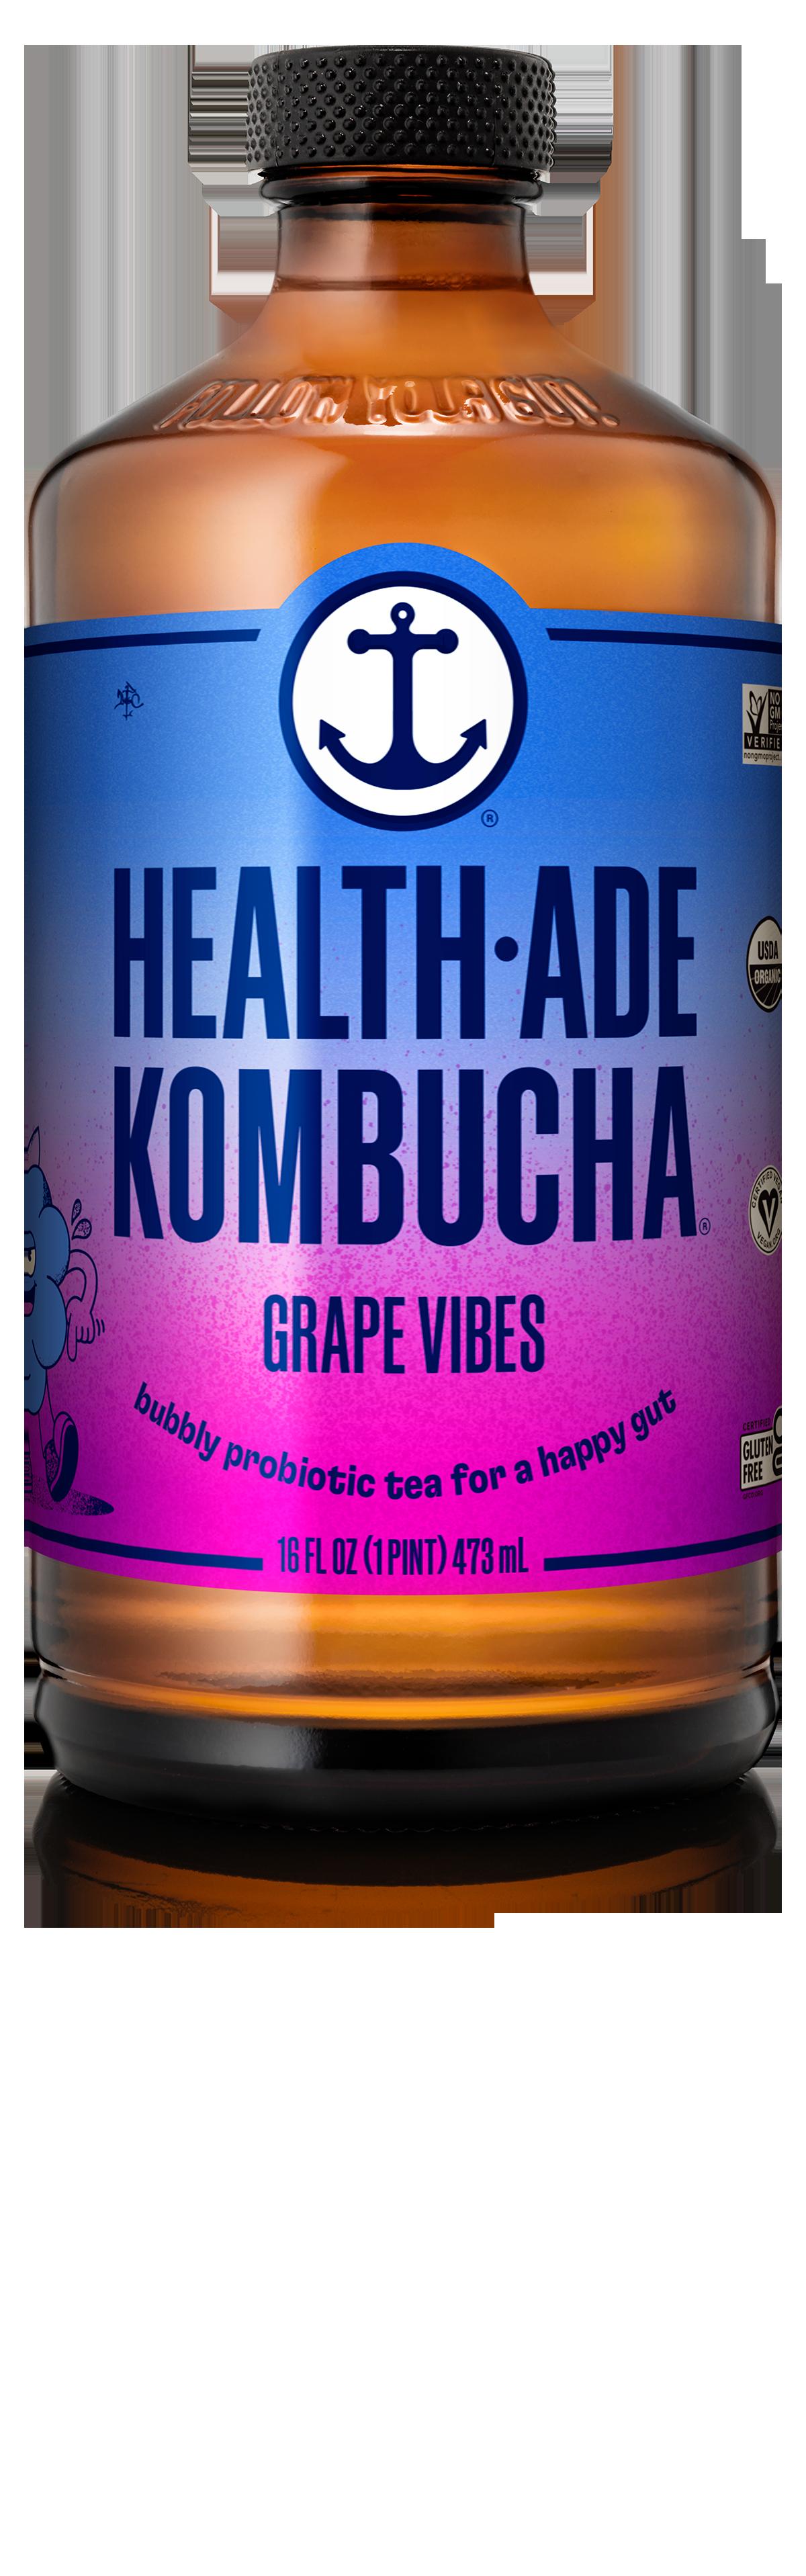 Health-Ade Kombucha Grape Vibes